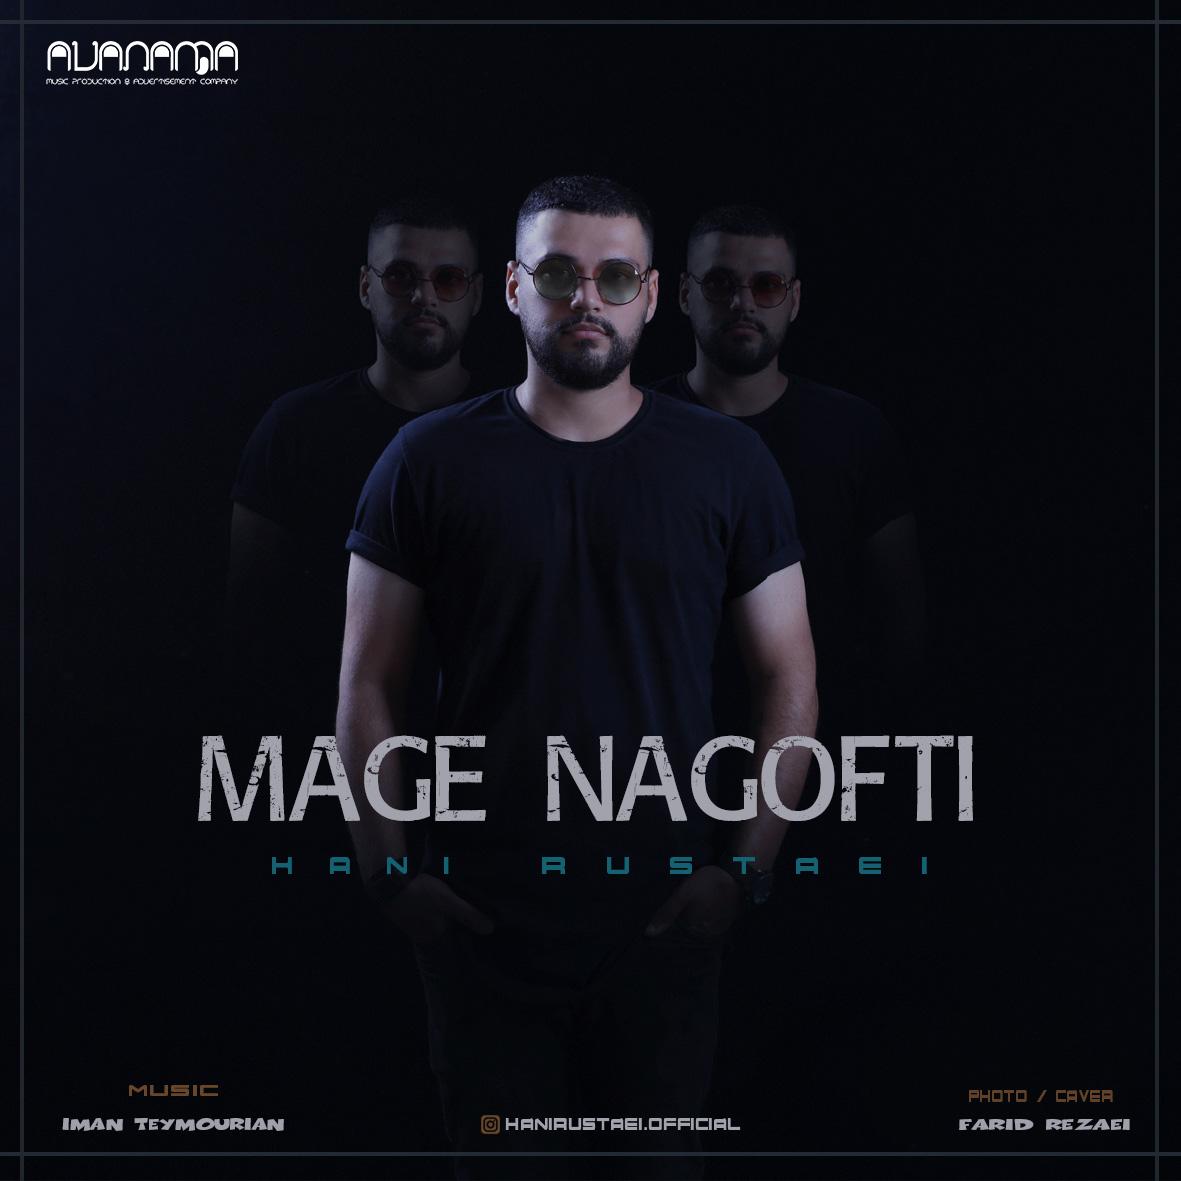 Hani Rustaei – Mage Nagofti